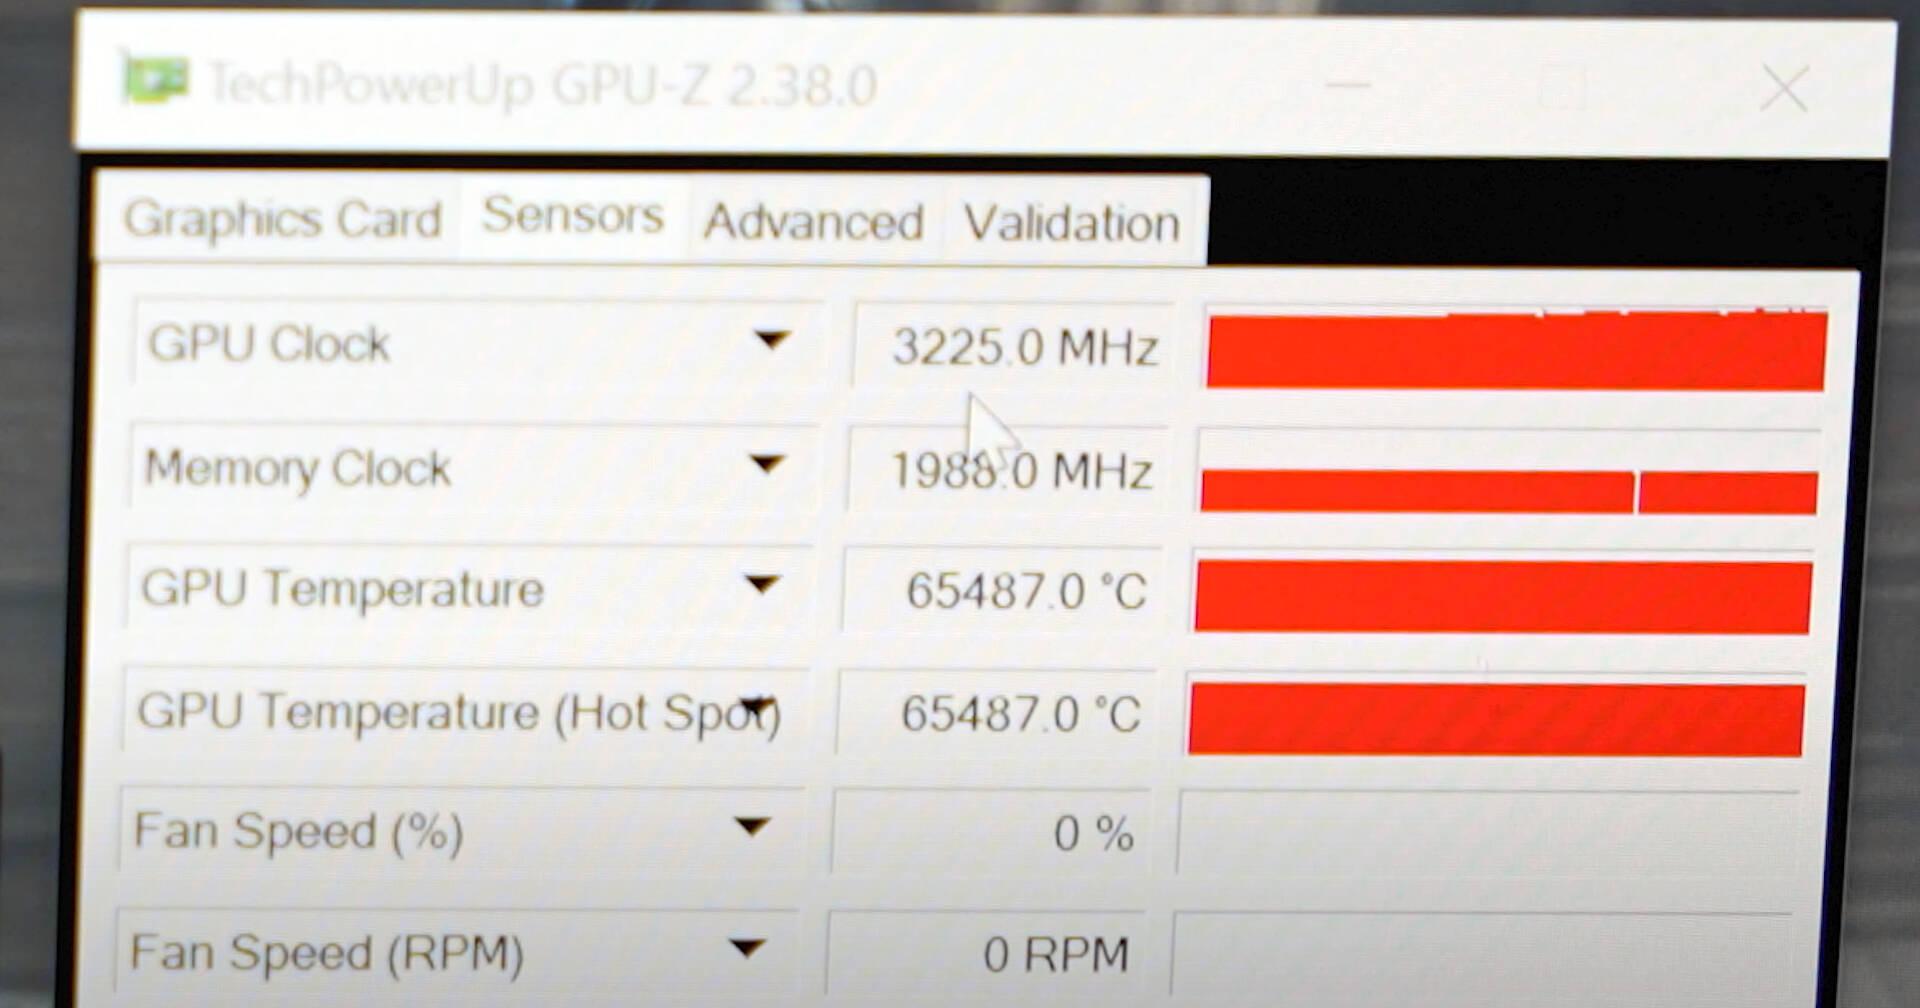 AMD Radeon RX 6900 XT overclock